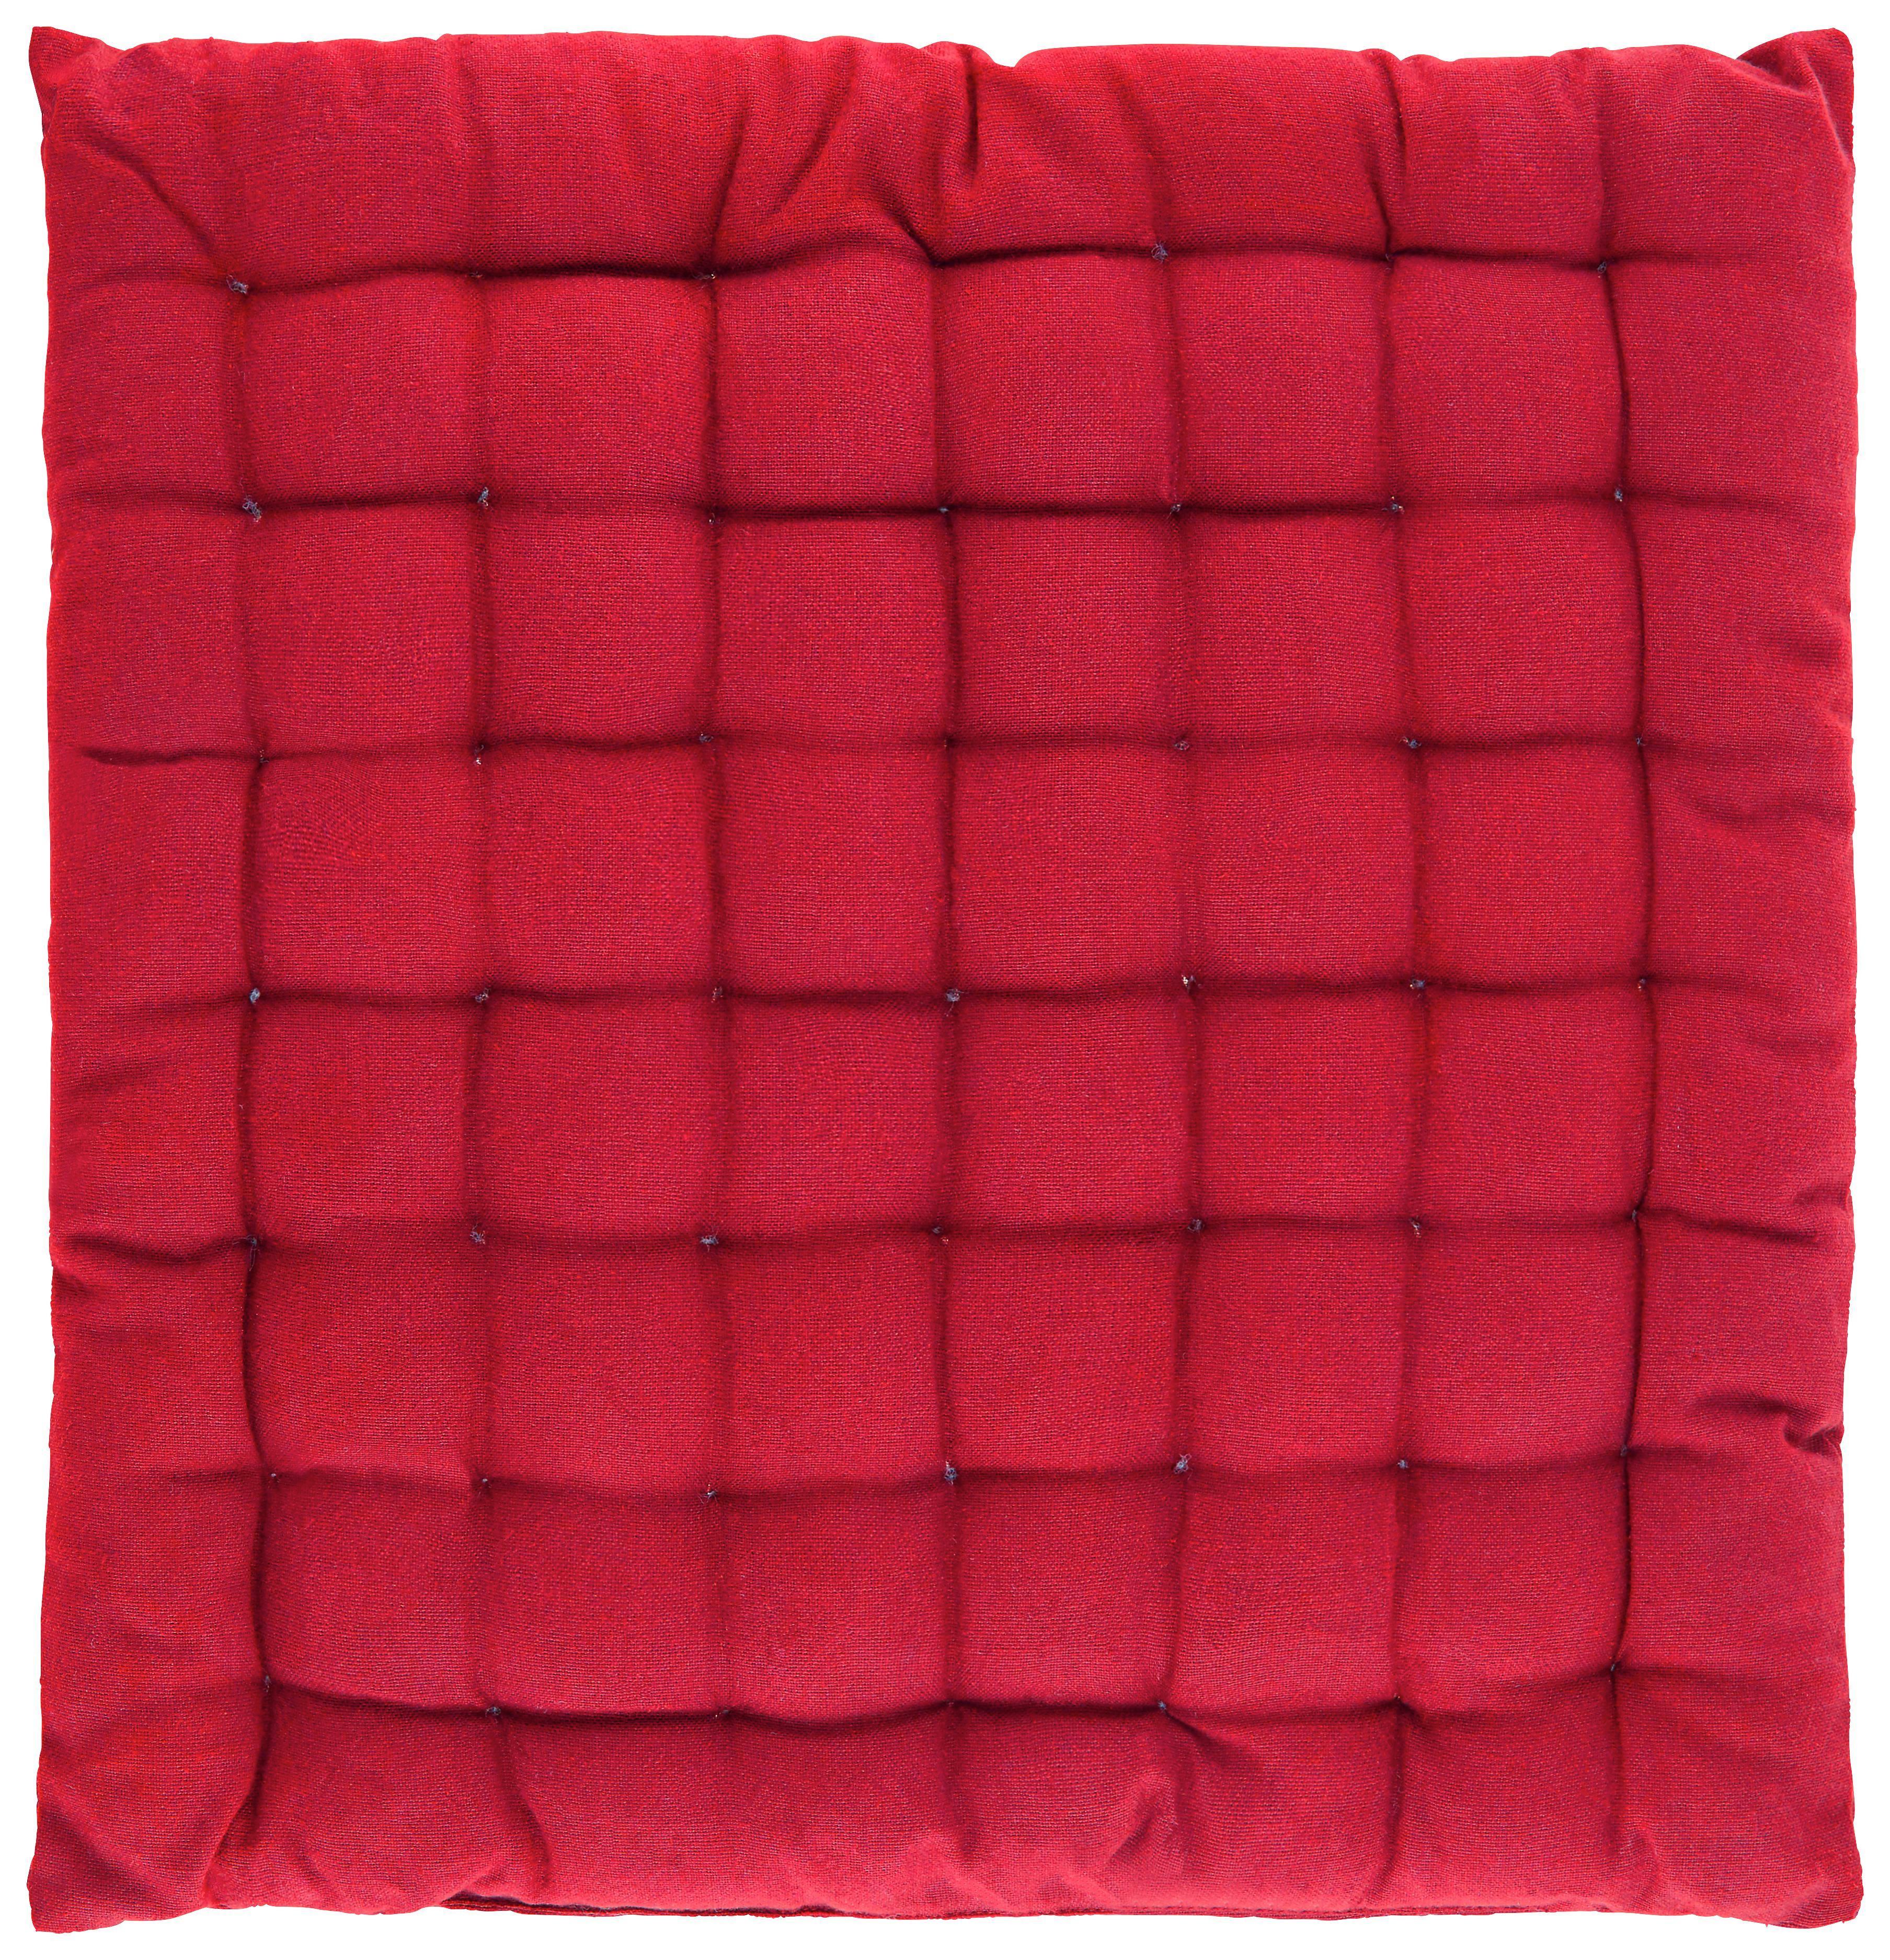 Sitzkissen Kathrin in Rot, ca. 40x40cm - Rot, Textil (40/40cm) - MÖMAX modern living